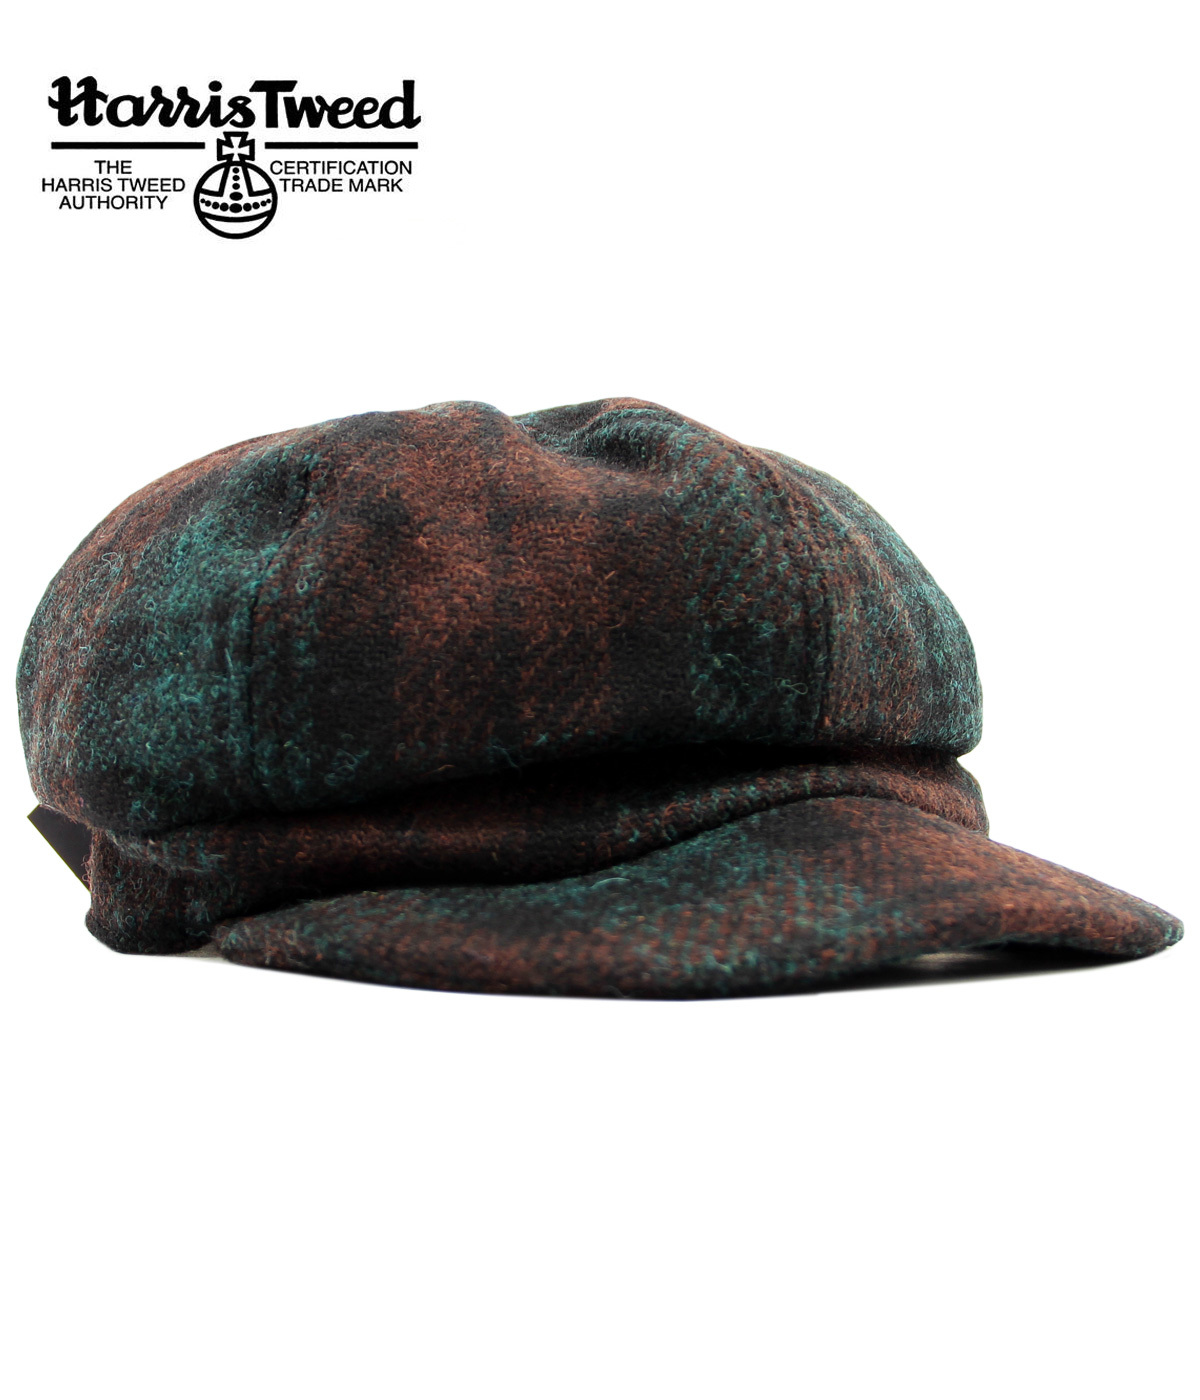 62efe6cf73f FAILSWORTH Harris Tweed Ladies Retro 60s Mod Tartan Hat Green